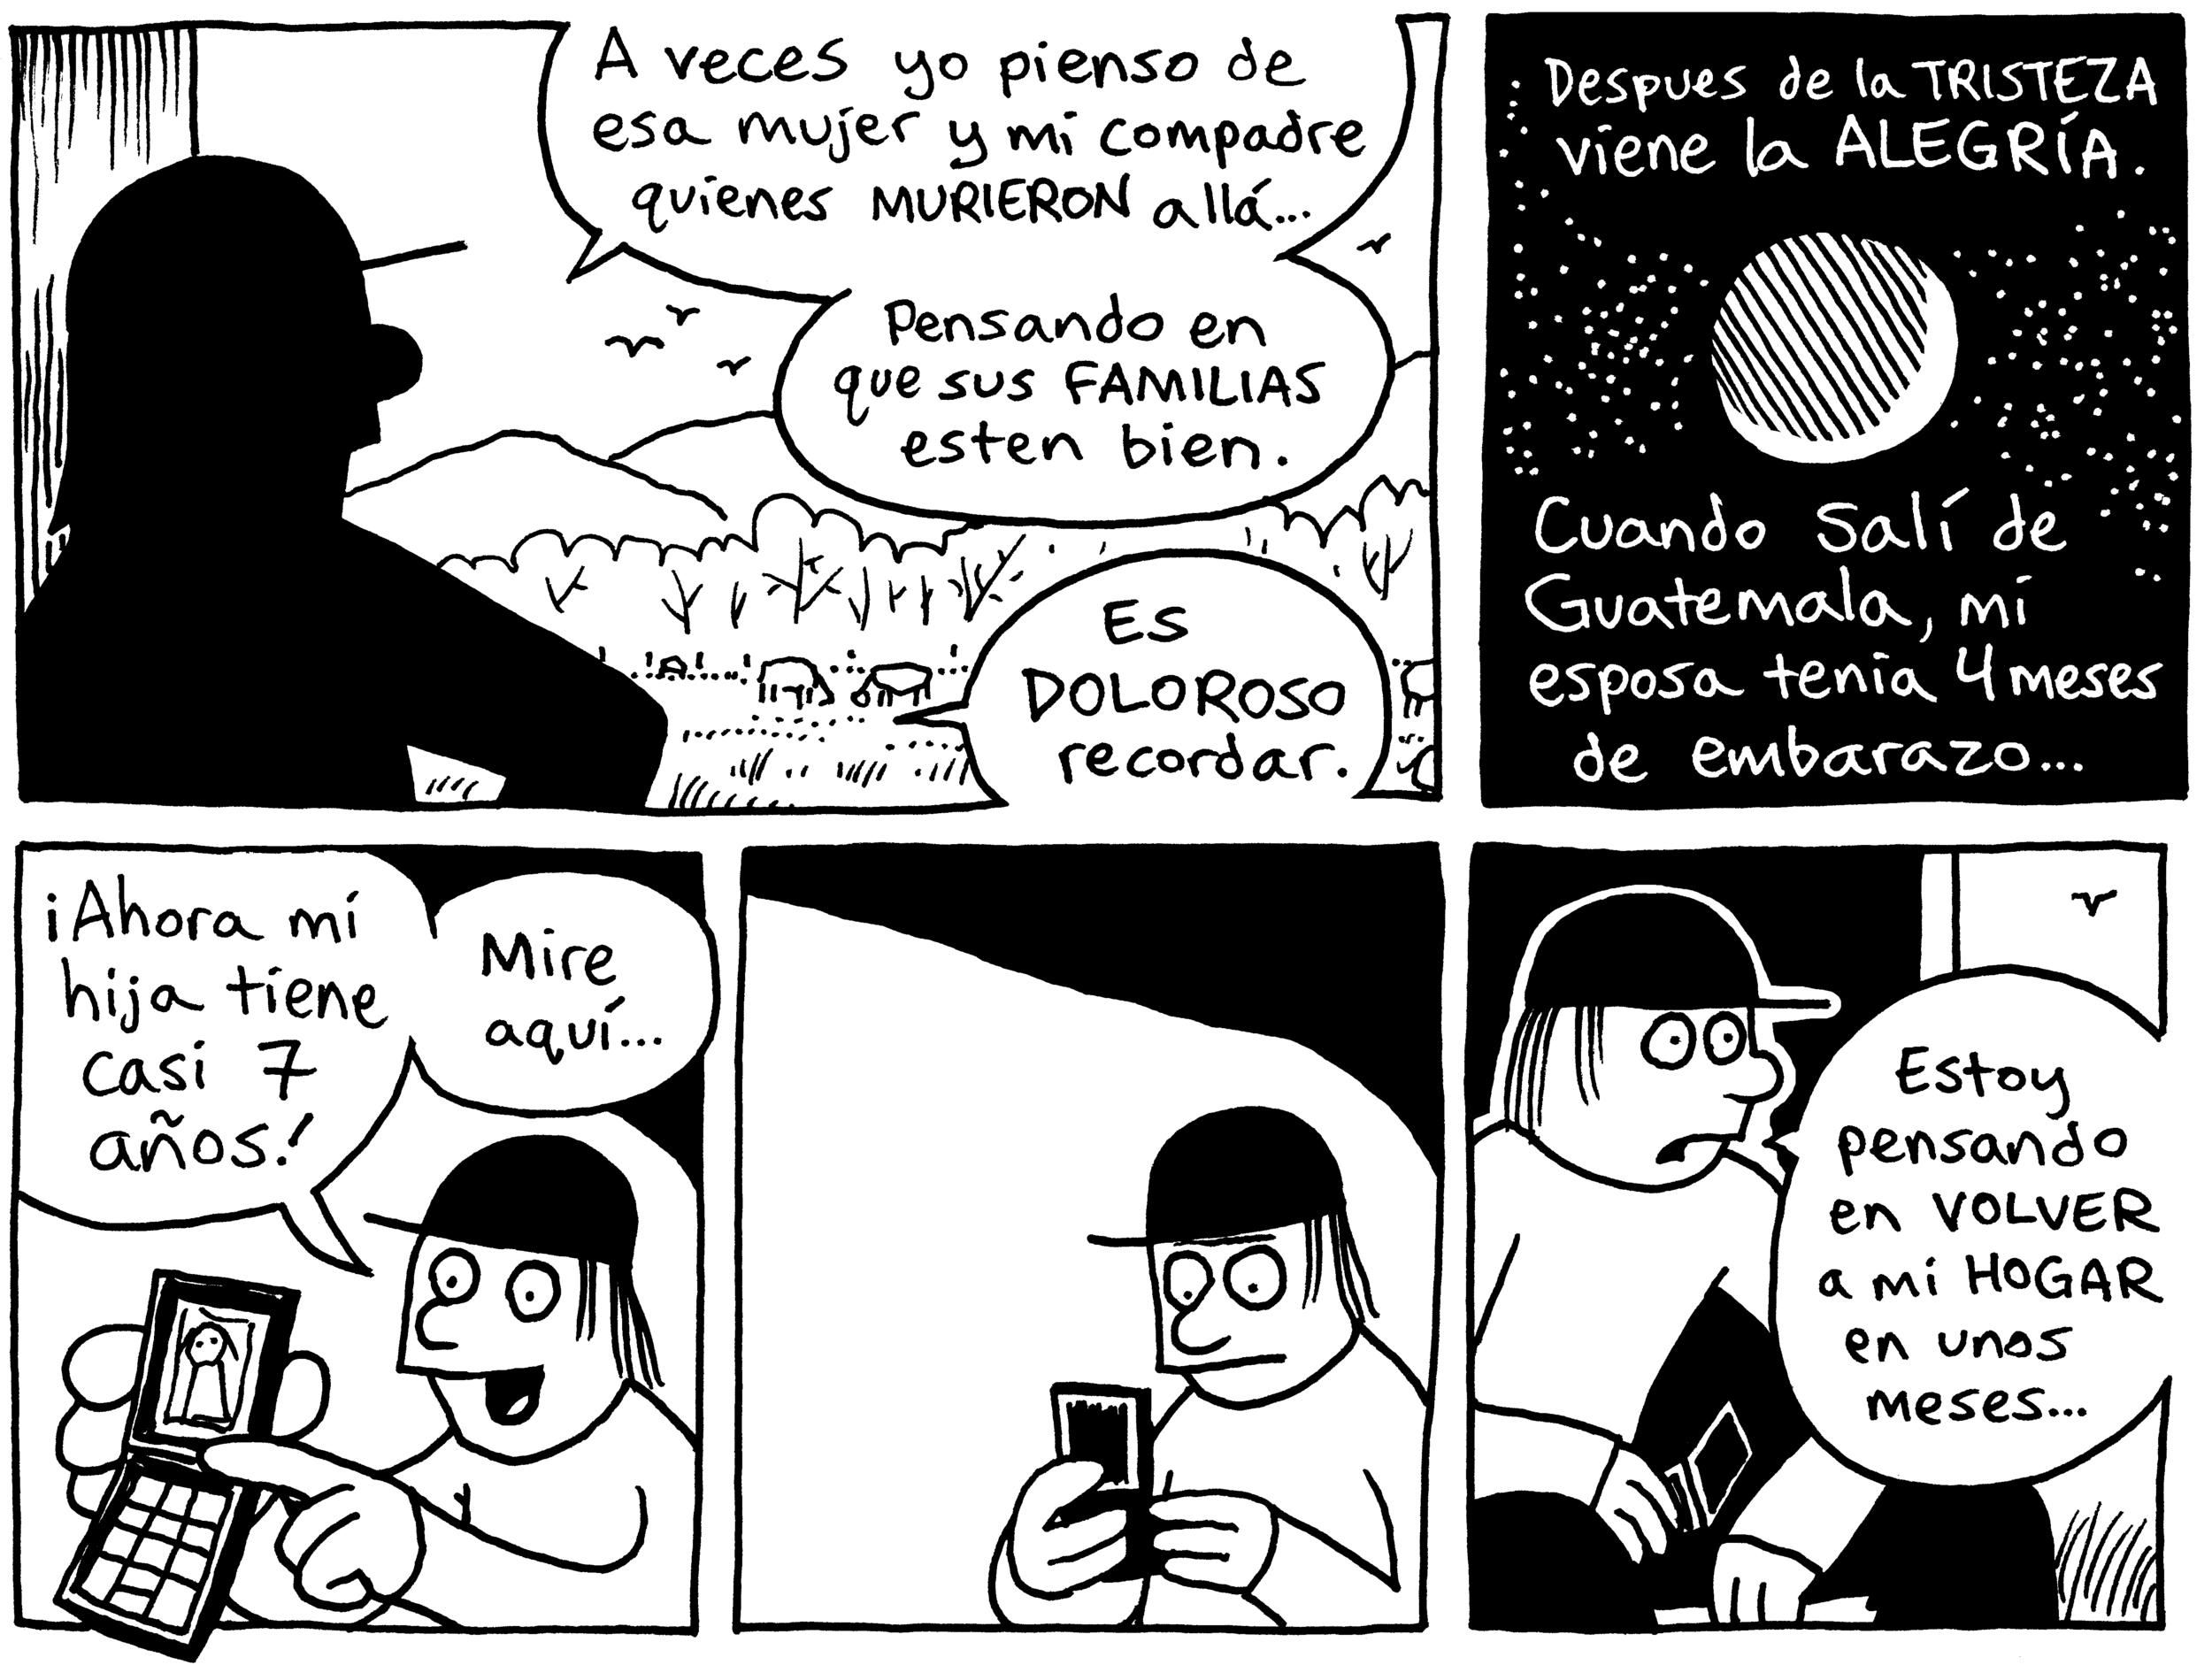 Jose-Esp-15.jpg